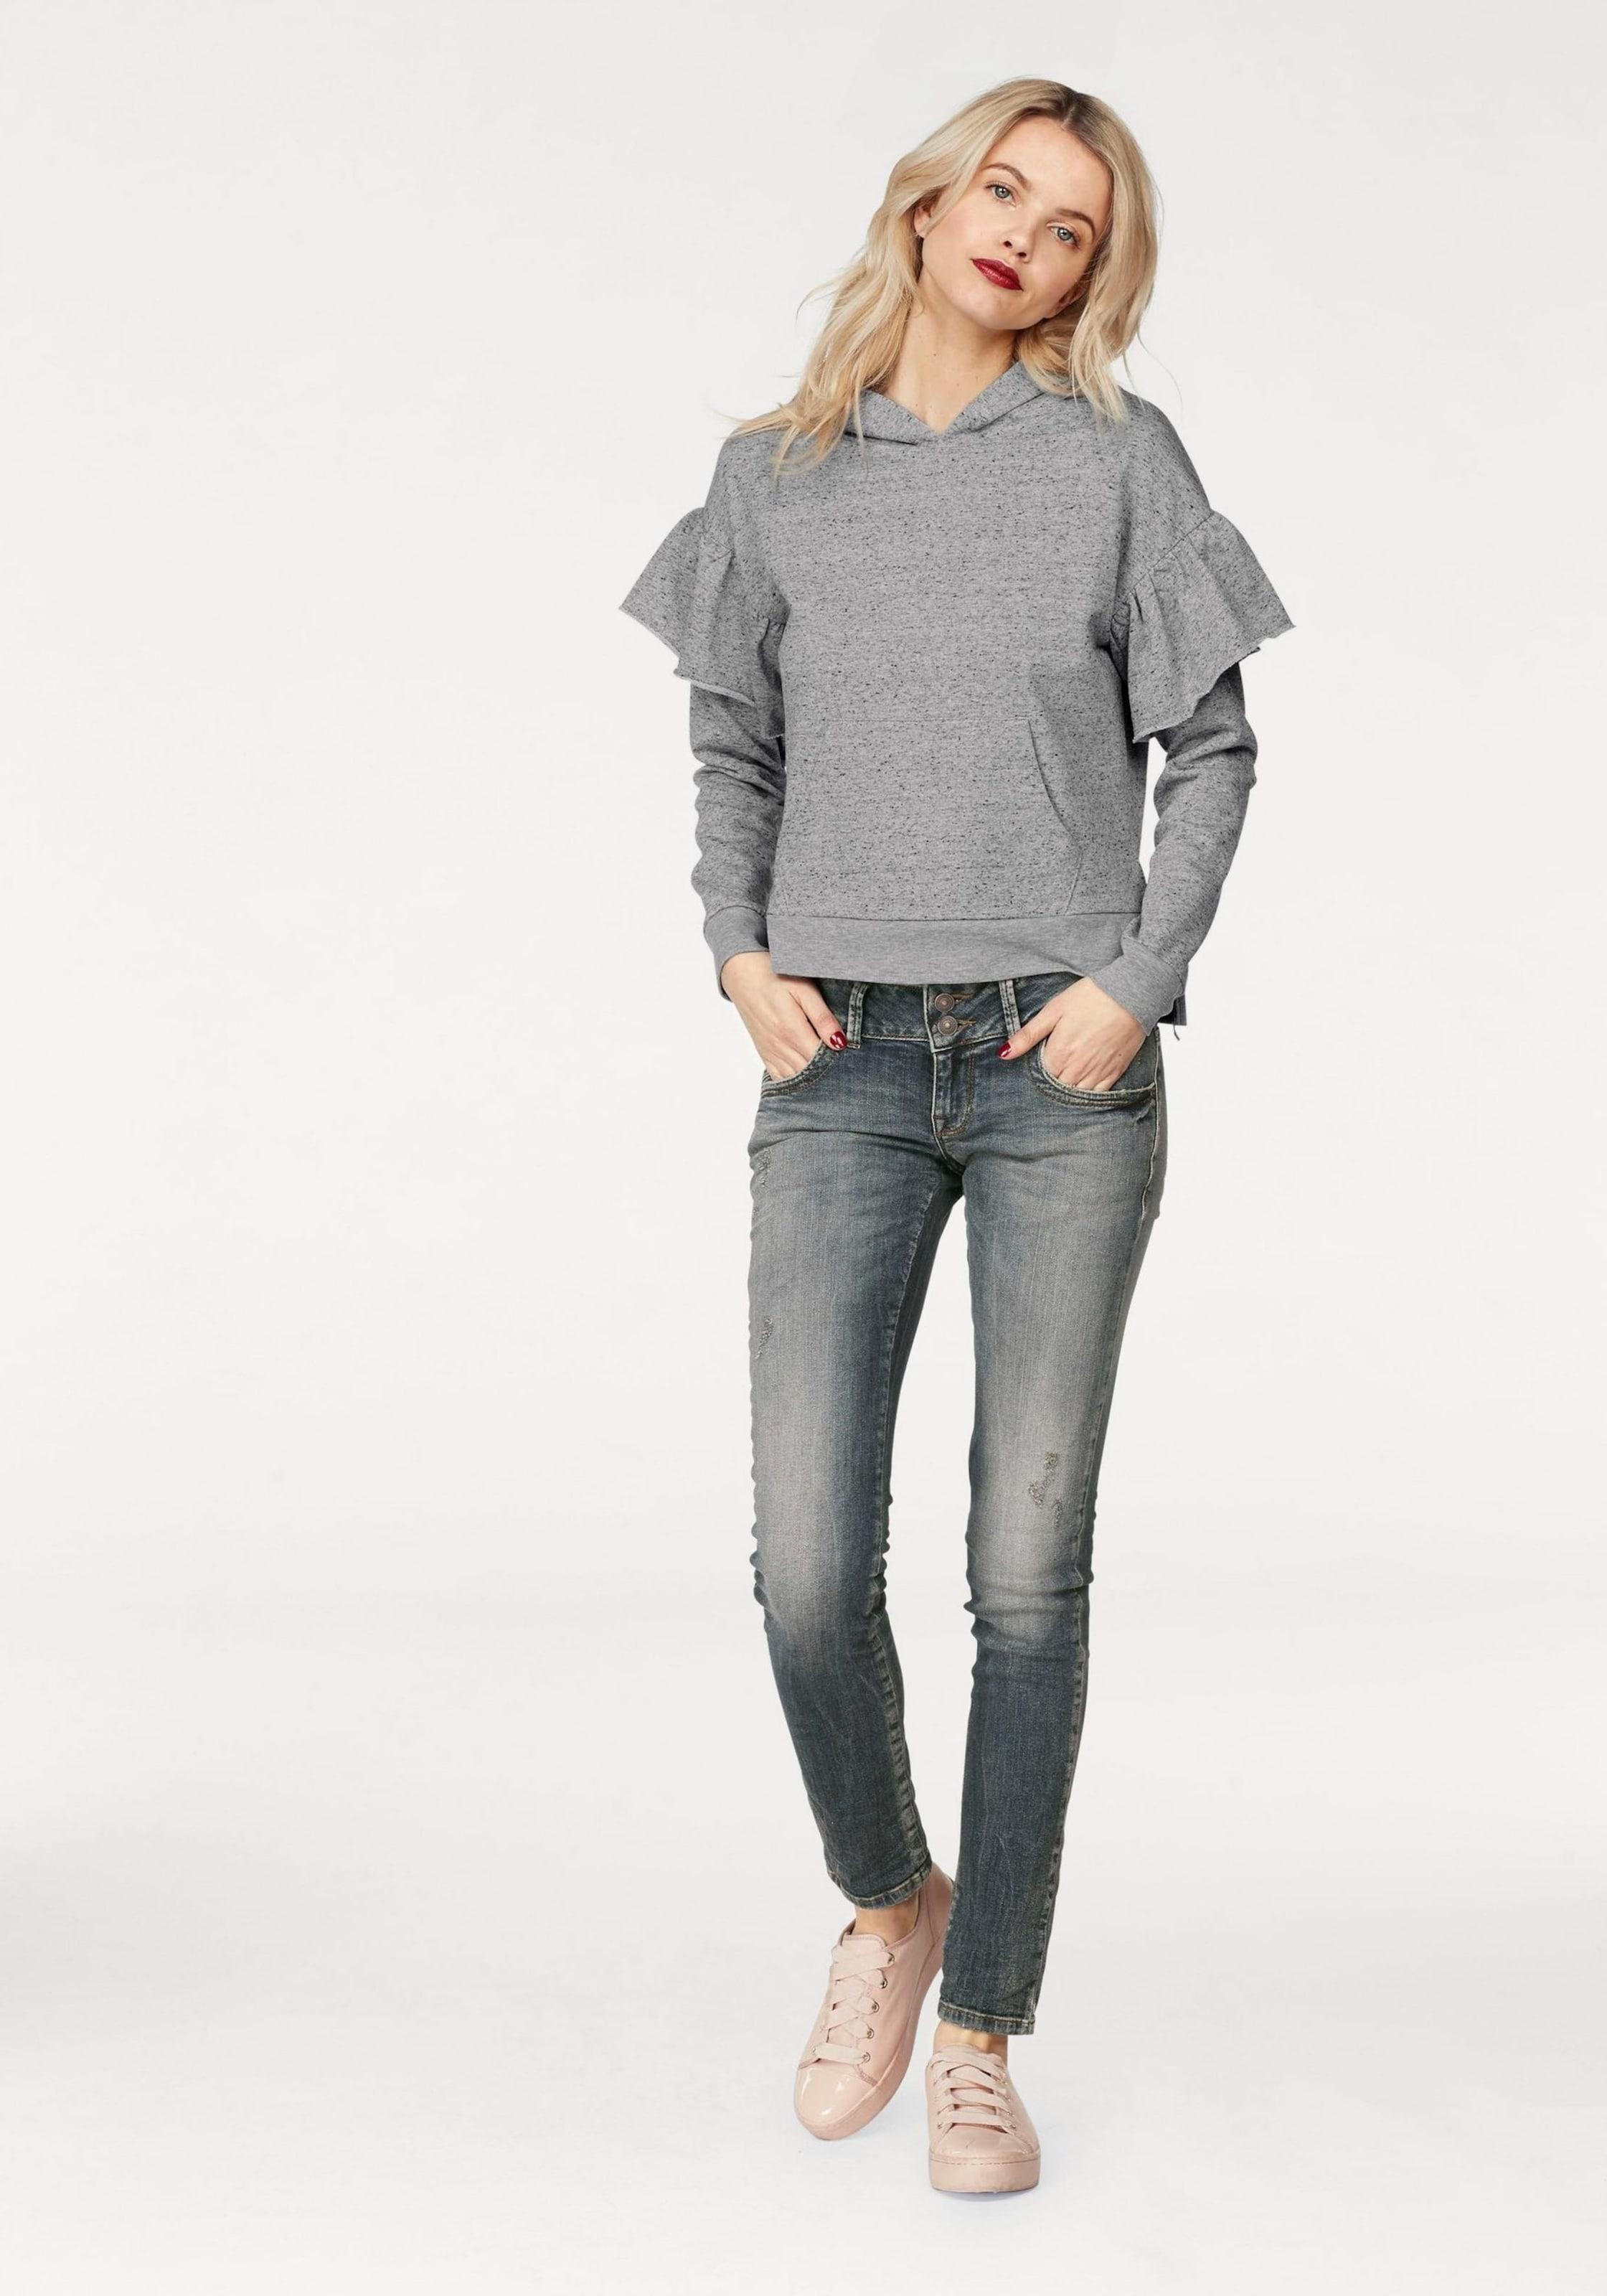 Ltb Denim Blue In 'molly' Jeans 5l1c3uTFKJ